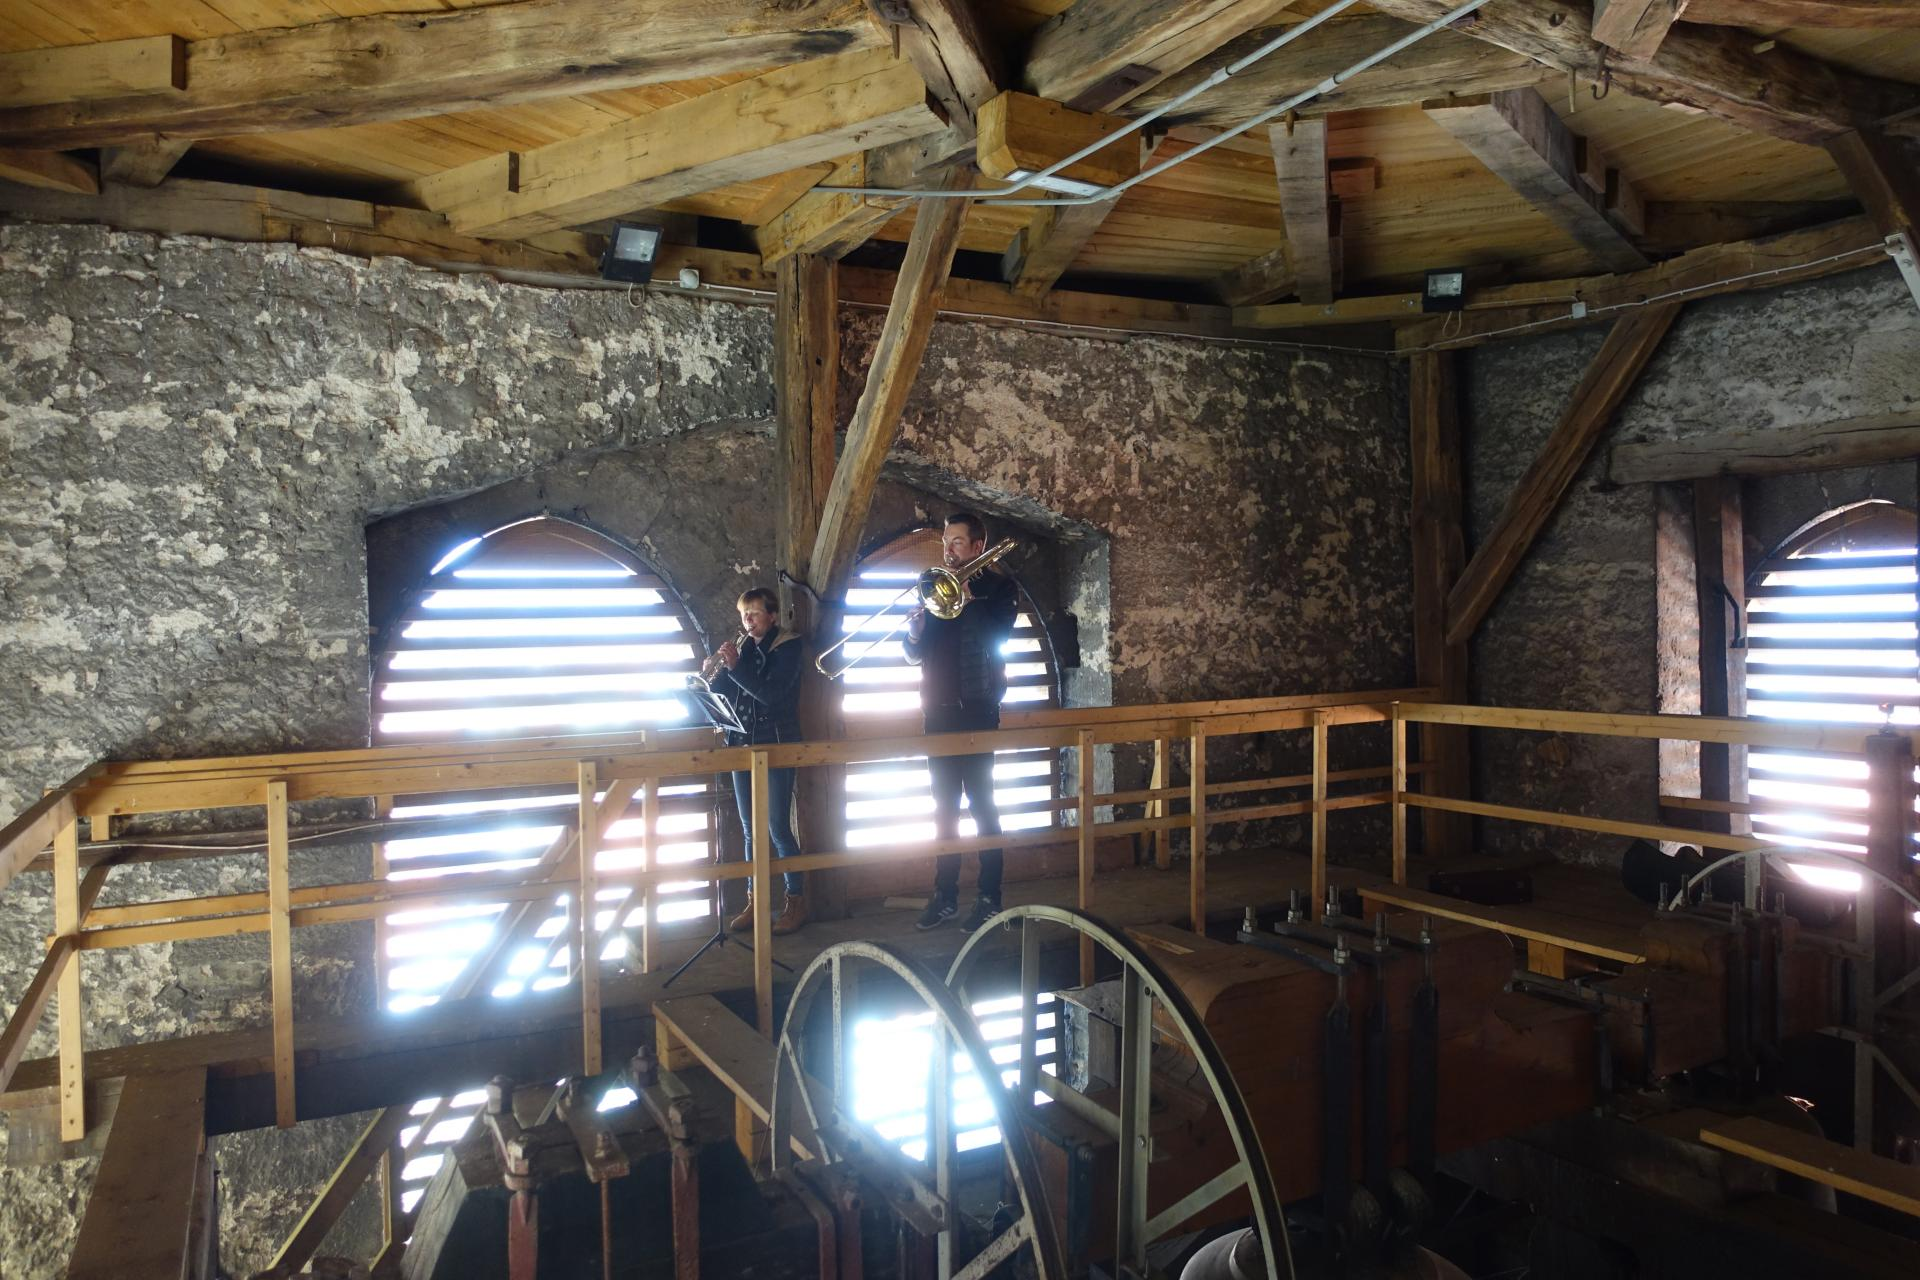 Blechbläserin und Blechbläser im Glockenturm an Palmarum